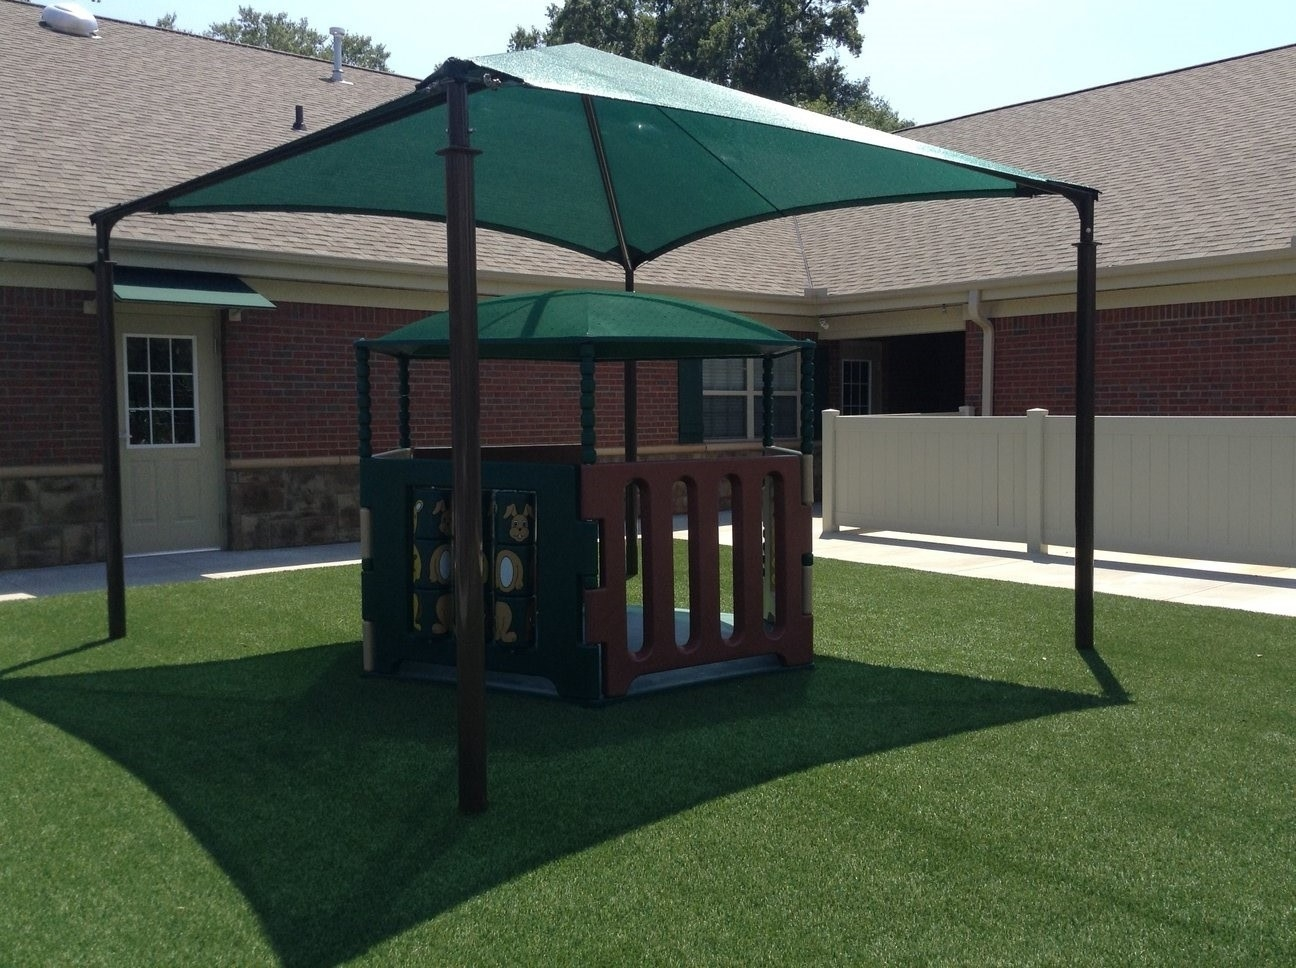 Primrose School of Greenville image 7